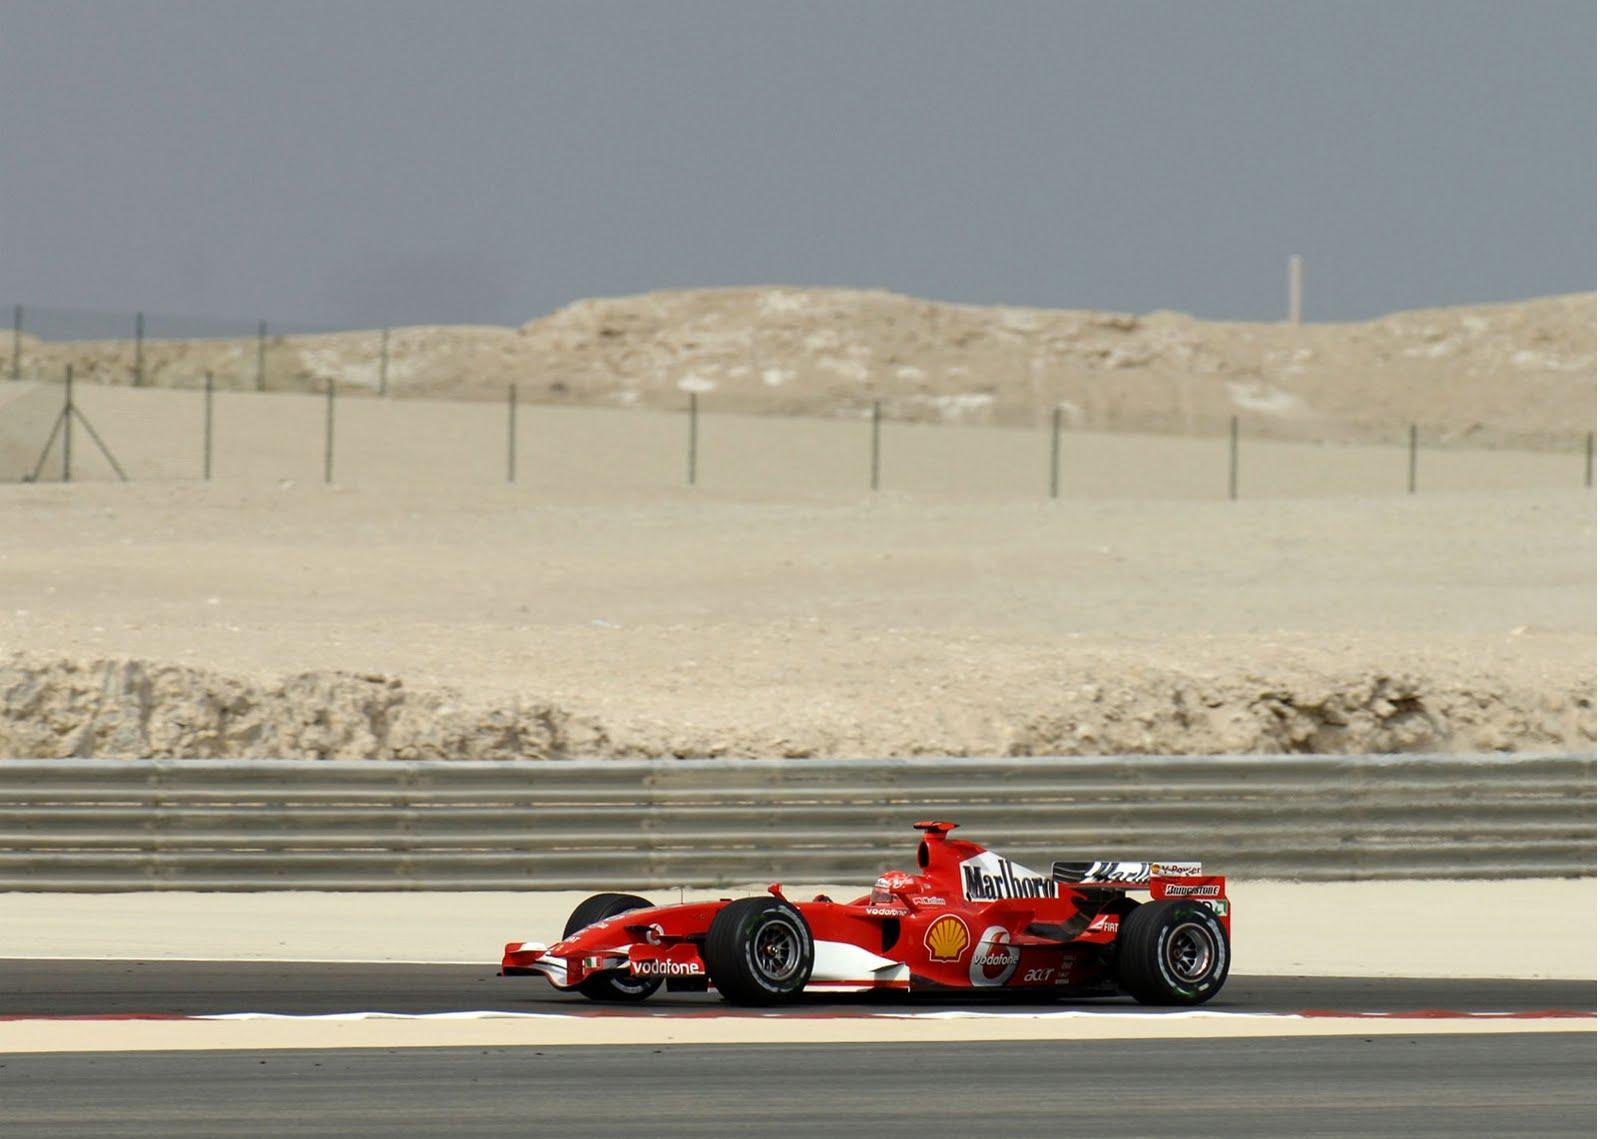 http://2.bp.blogspot.com/-3RqV368-Bsk/TcaVpYVEp8I/AAAAAAAAAPA/cdTmeAAjDG4/s1600/Ferrari_F1_201_1600.jpg